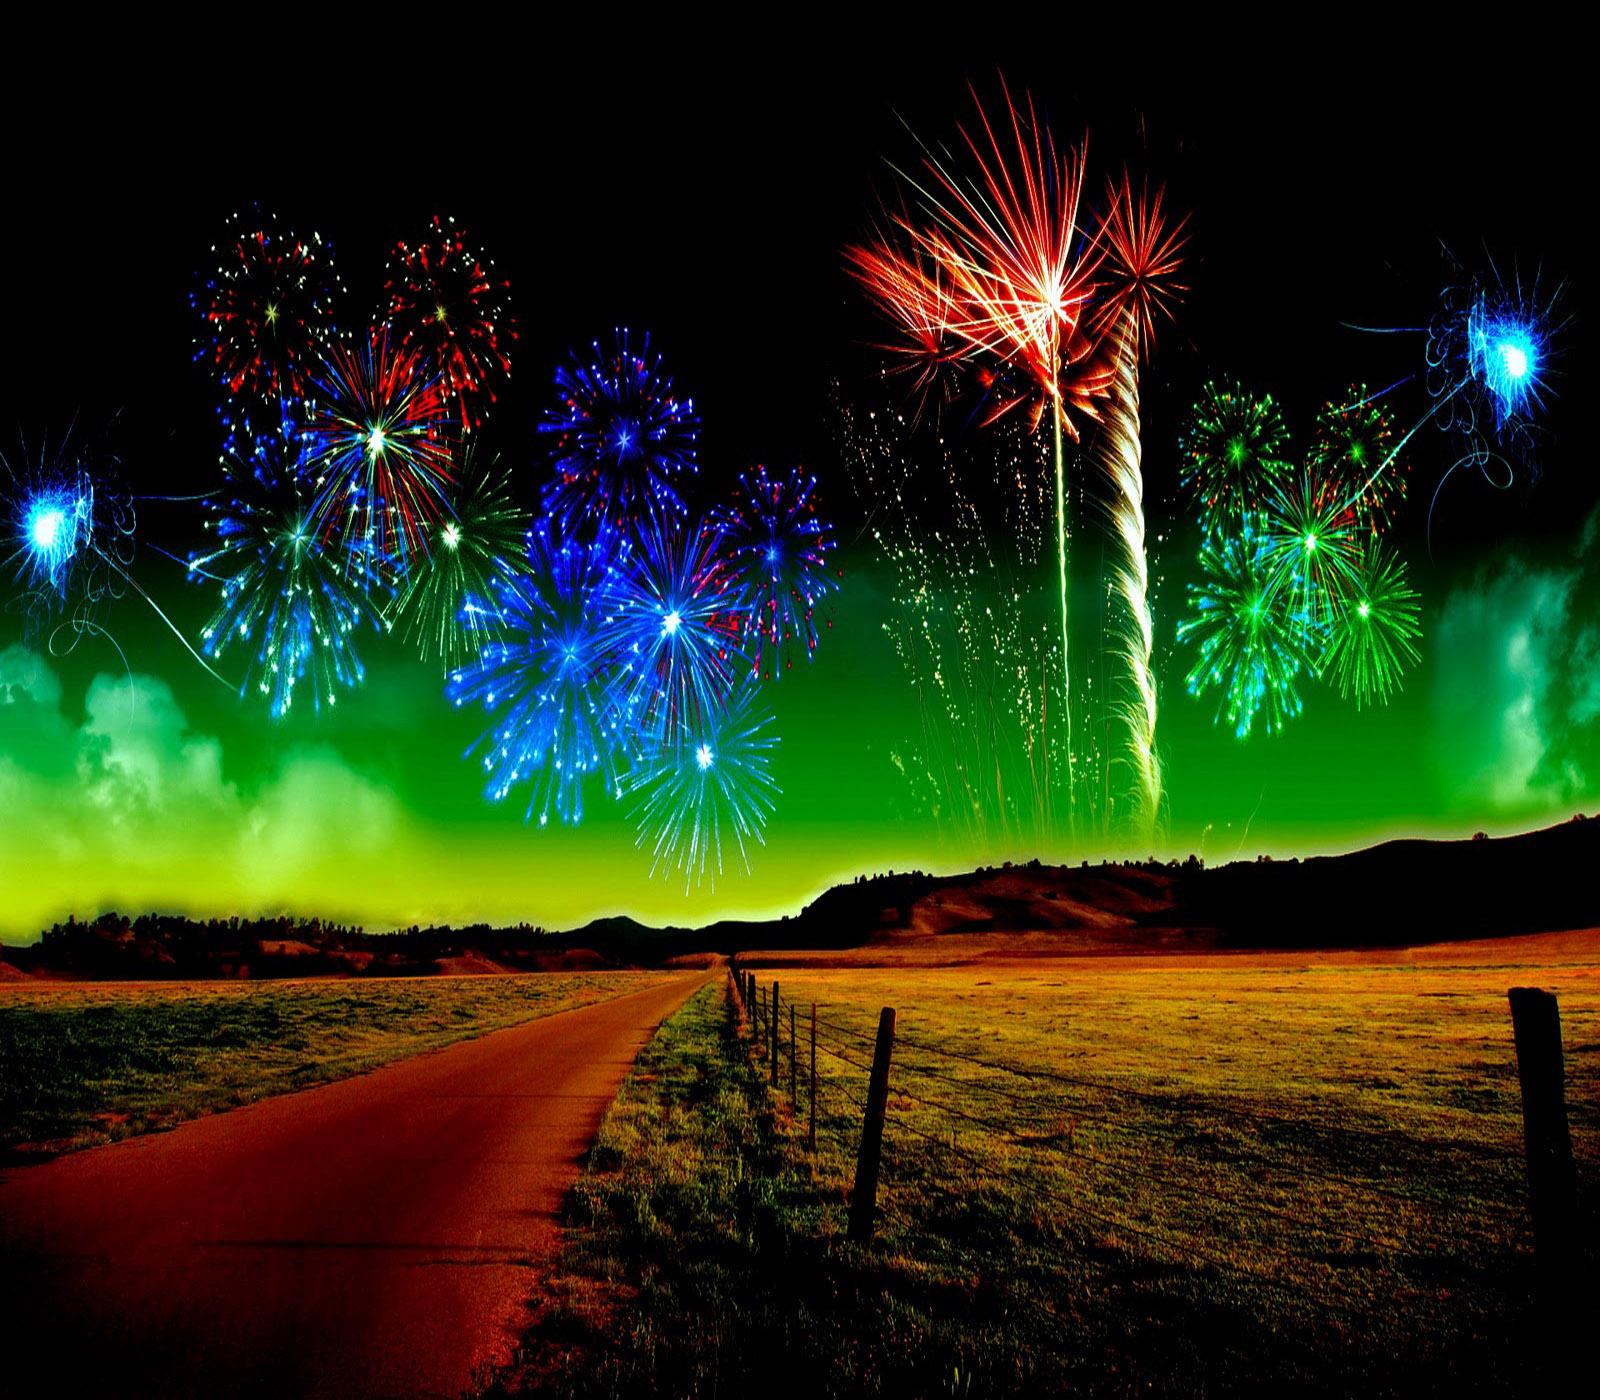 Happy-New-Year-2014-Fireworks-HD-Wallpaper-For-Desktop-1.jpg